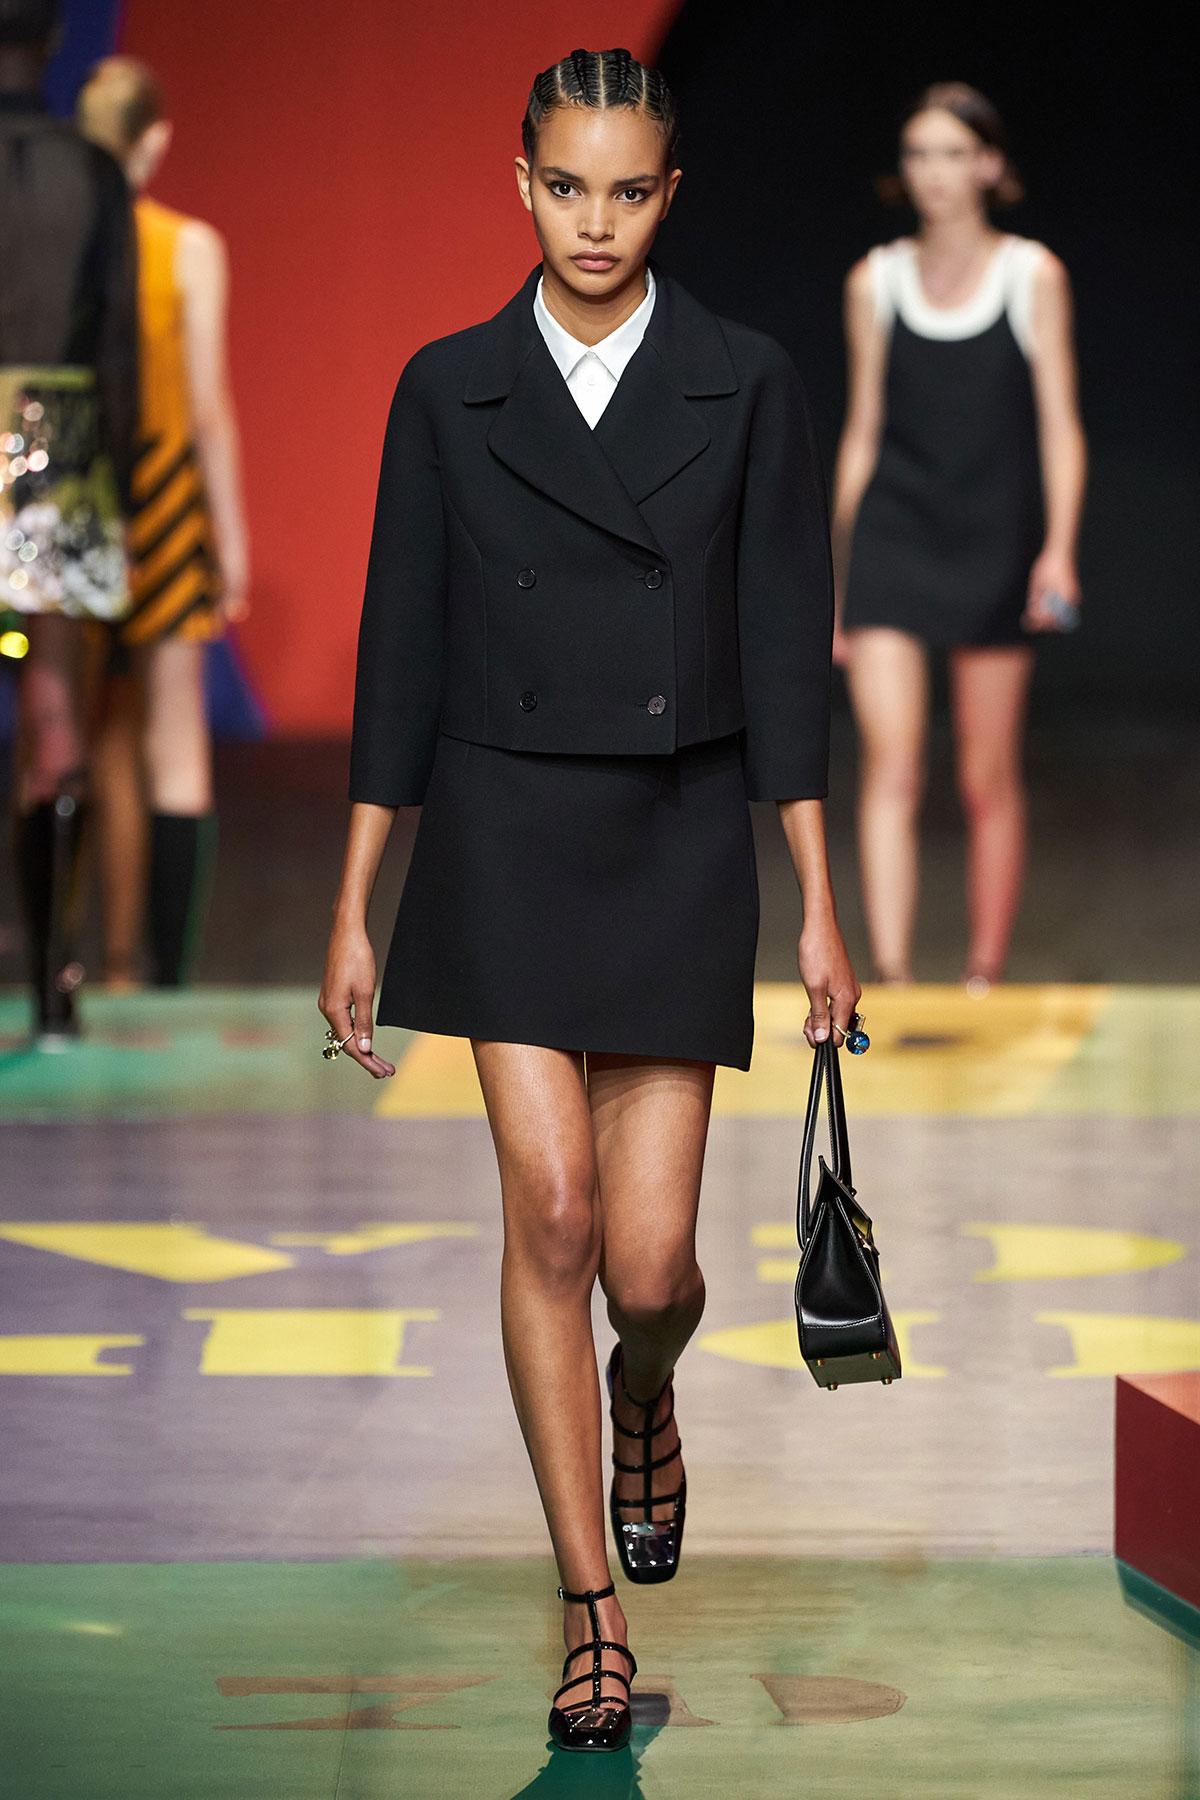 Dior Spring Summer 2022 Collection